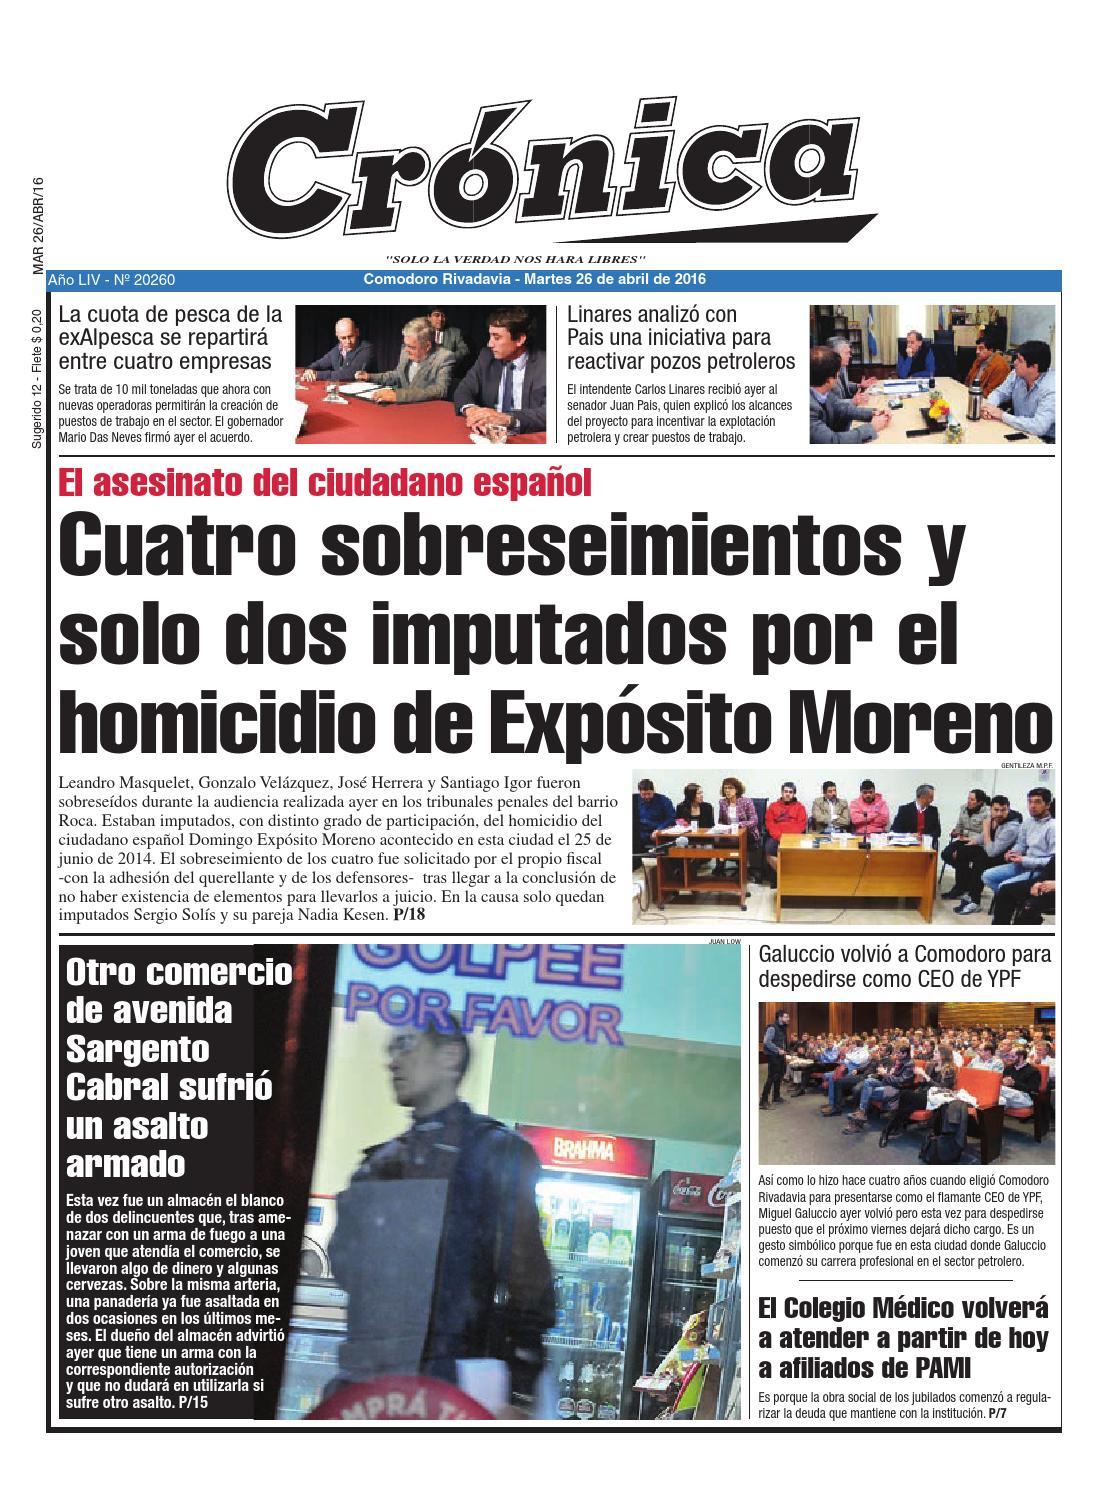 8325cb9699eb3c1b9642268942883772 by Diario Crónica - issuu